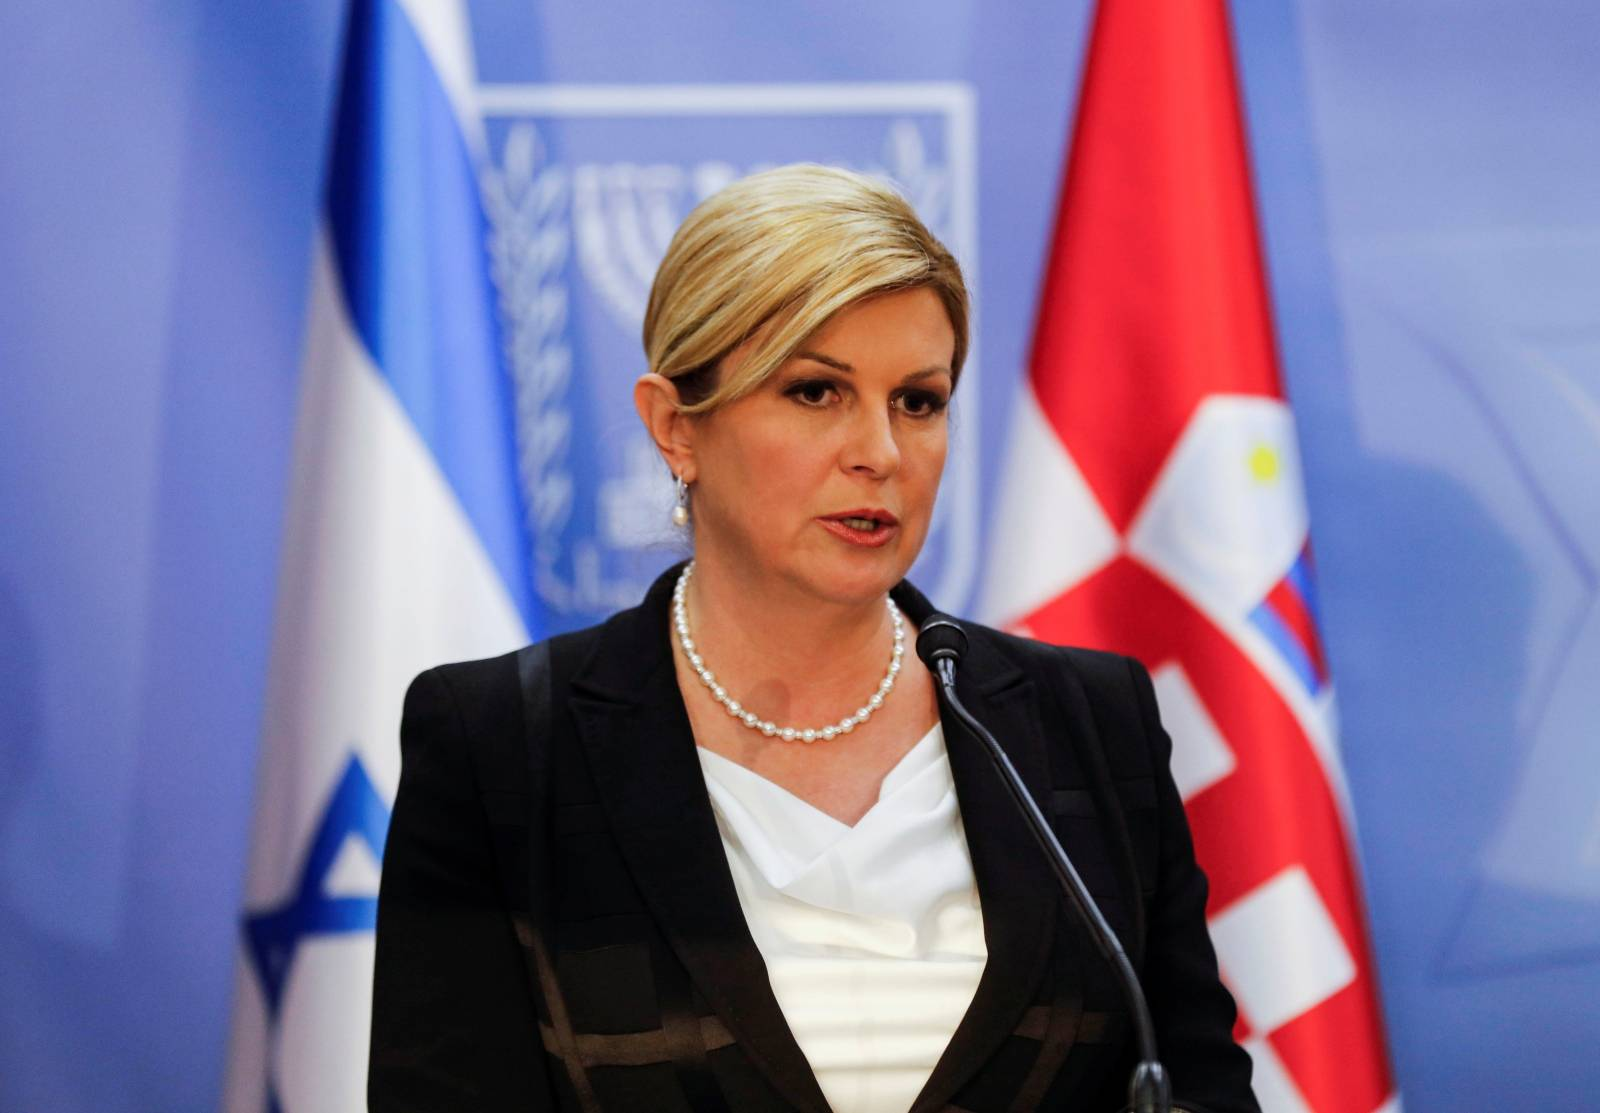 Croatia's President Kolinda Grabar-Kitarovic speaks as she holds a joint news conference with Israeli Prime Minister Benjamin Netanyahu in Jerusalem